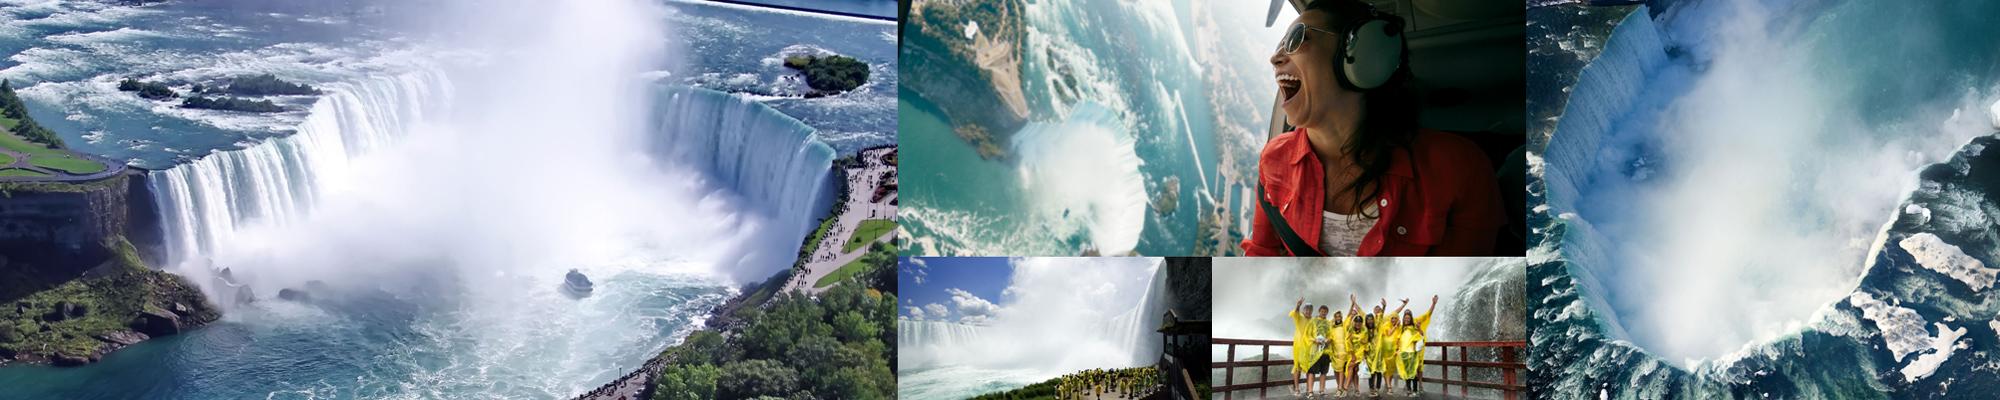 Cascate Niagara, Niagara Falls in Canada